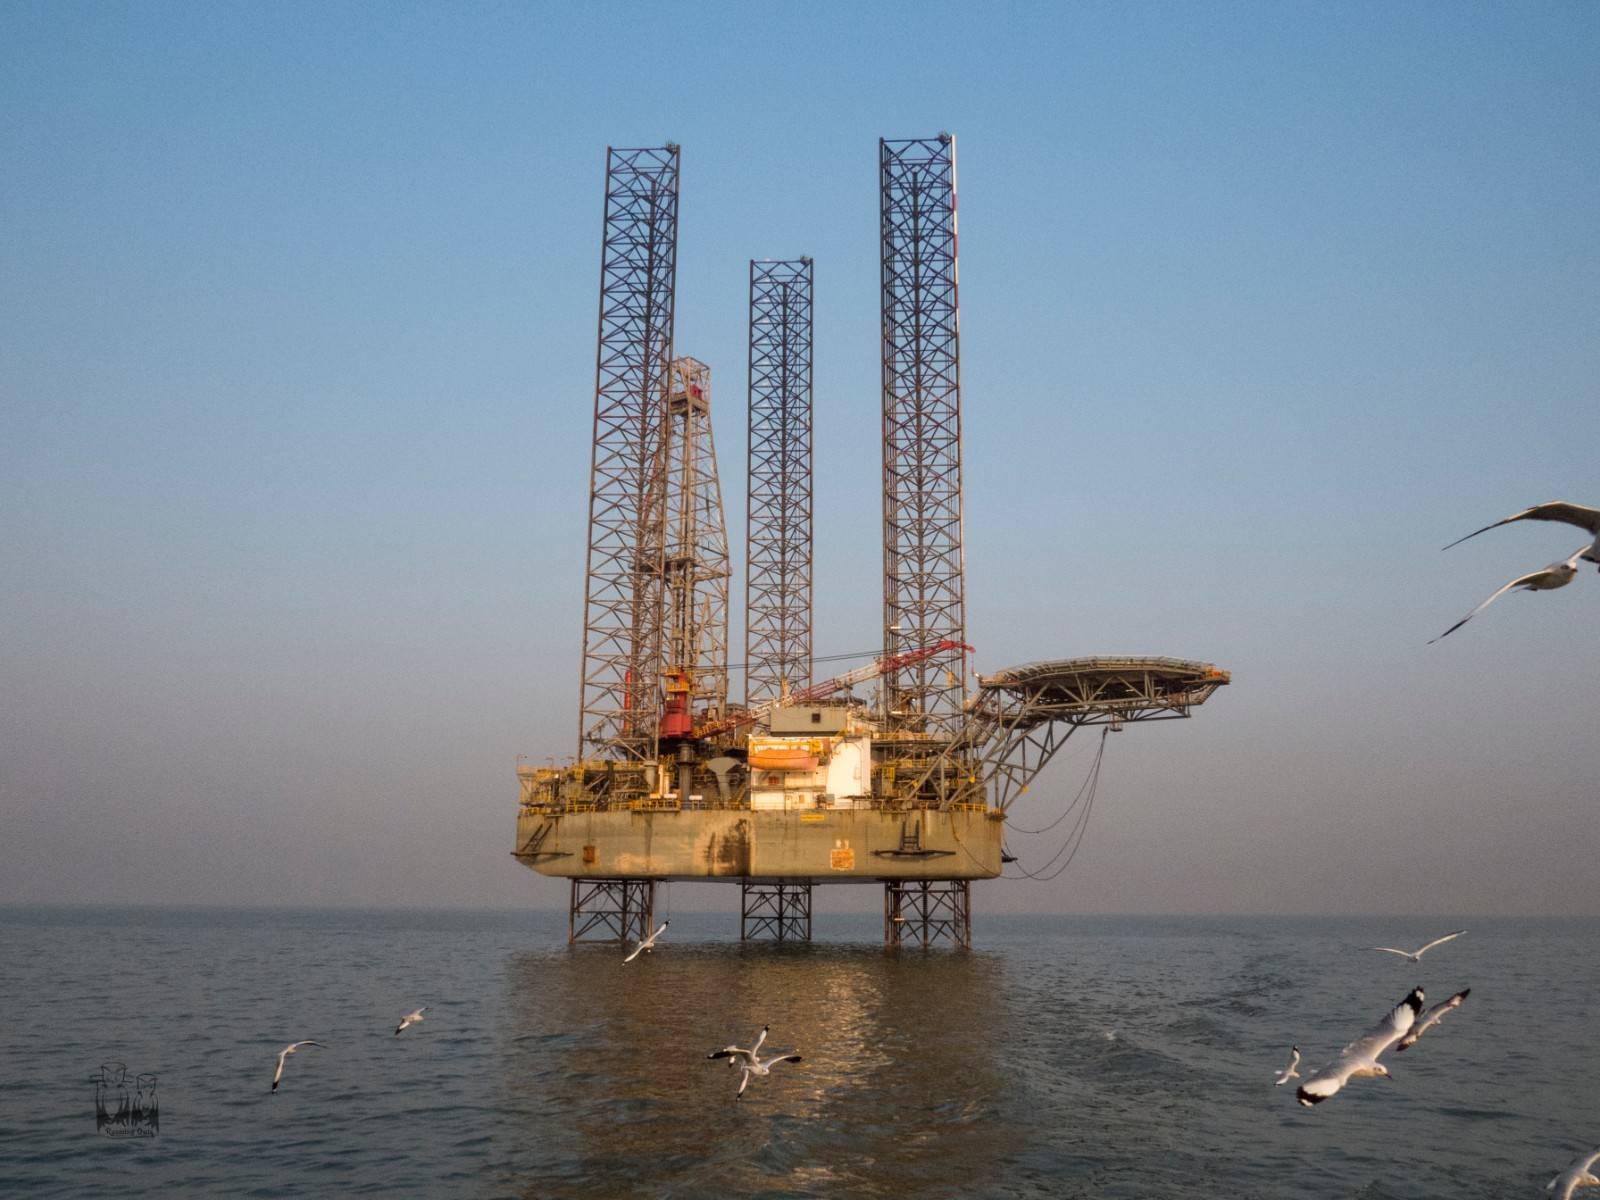 ONGC offshore oil rig,mumbai jetty,mandwa voyage